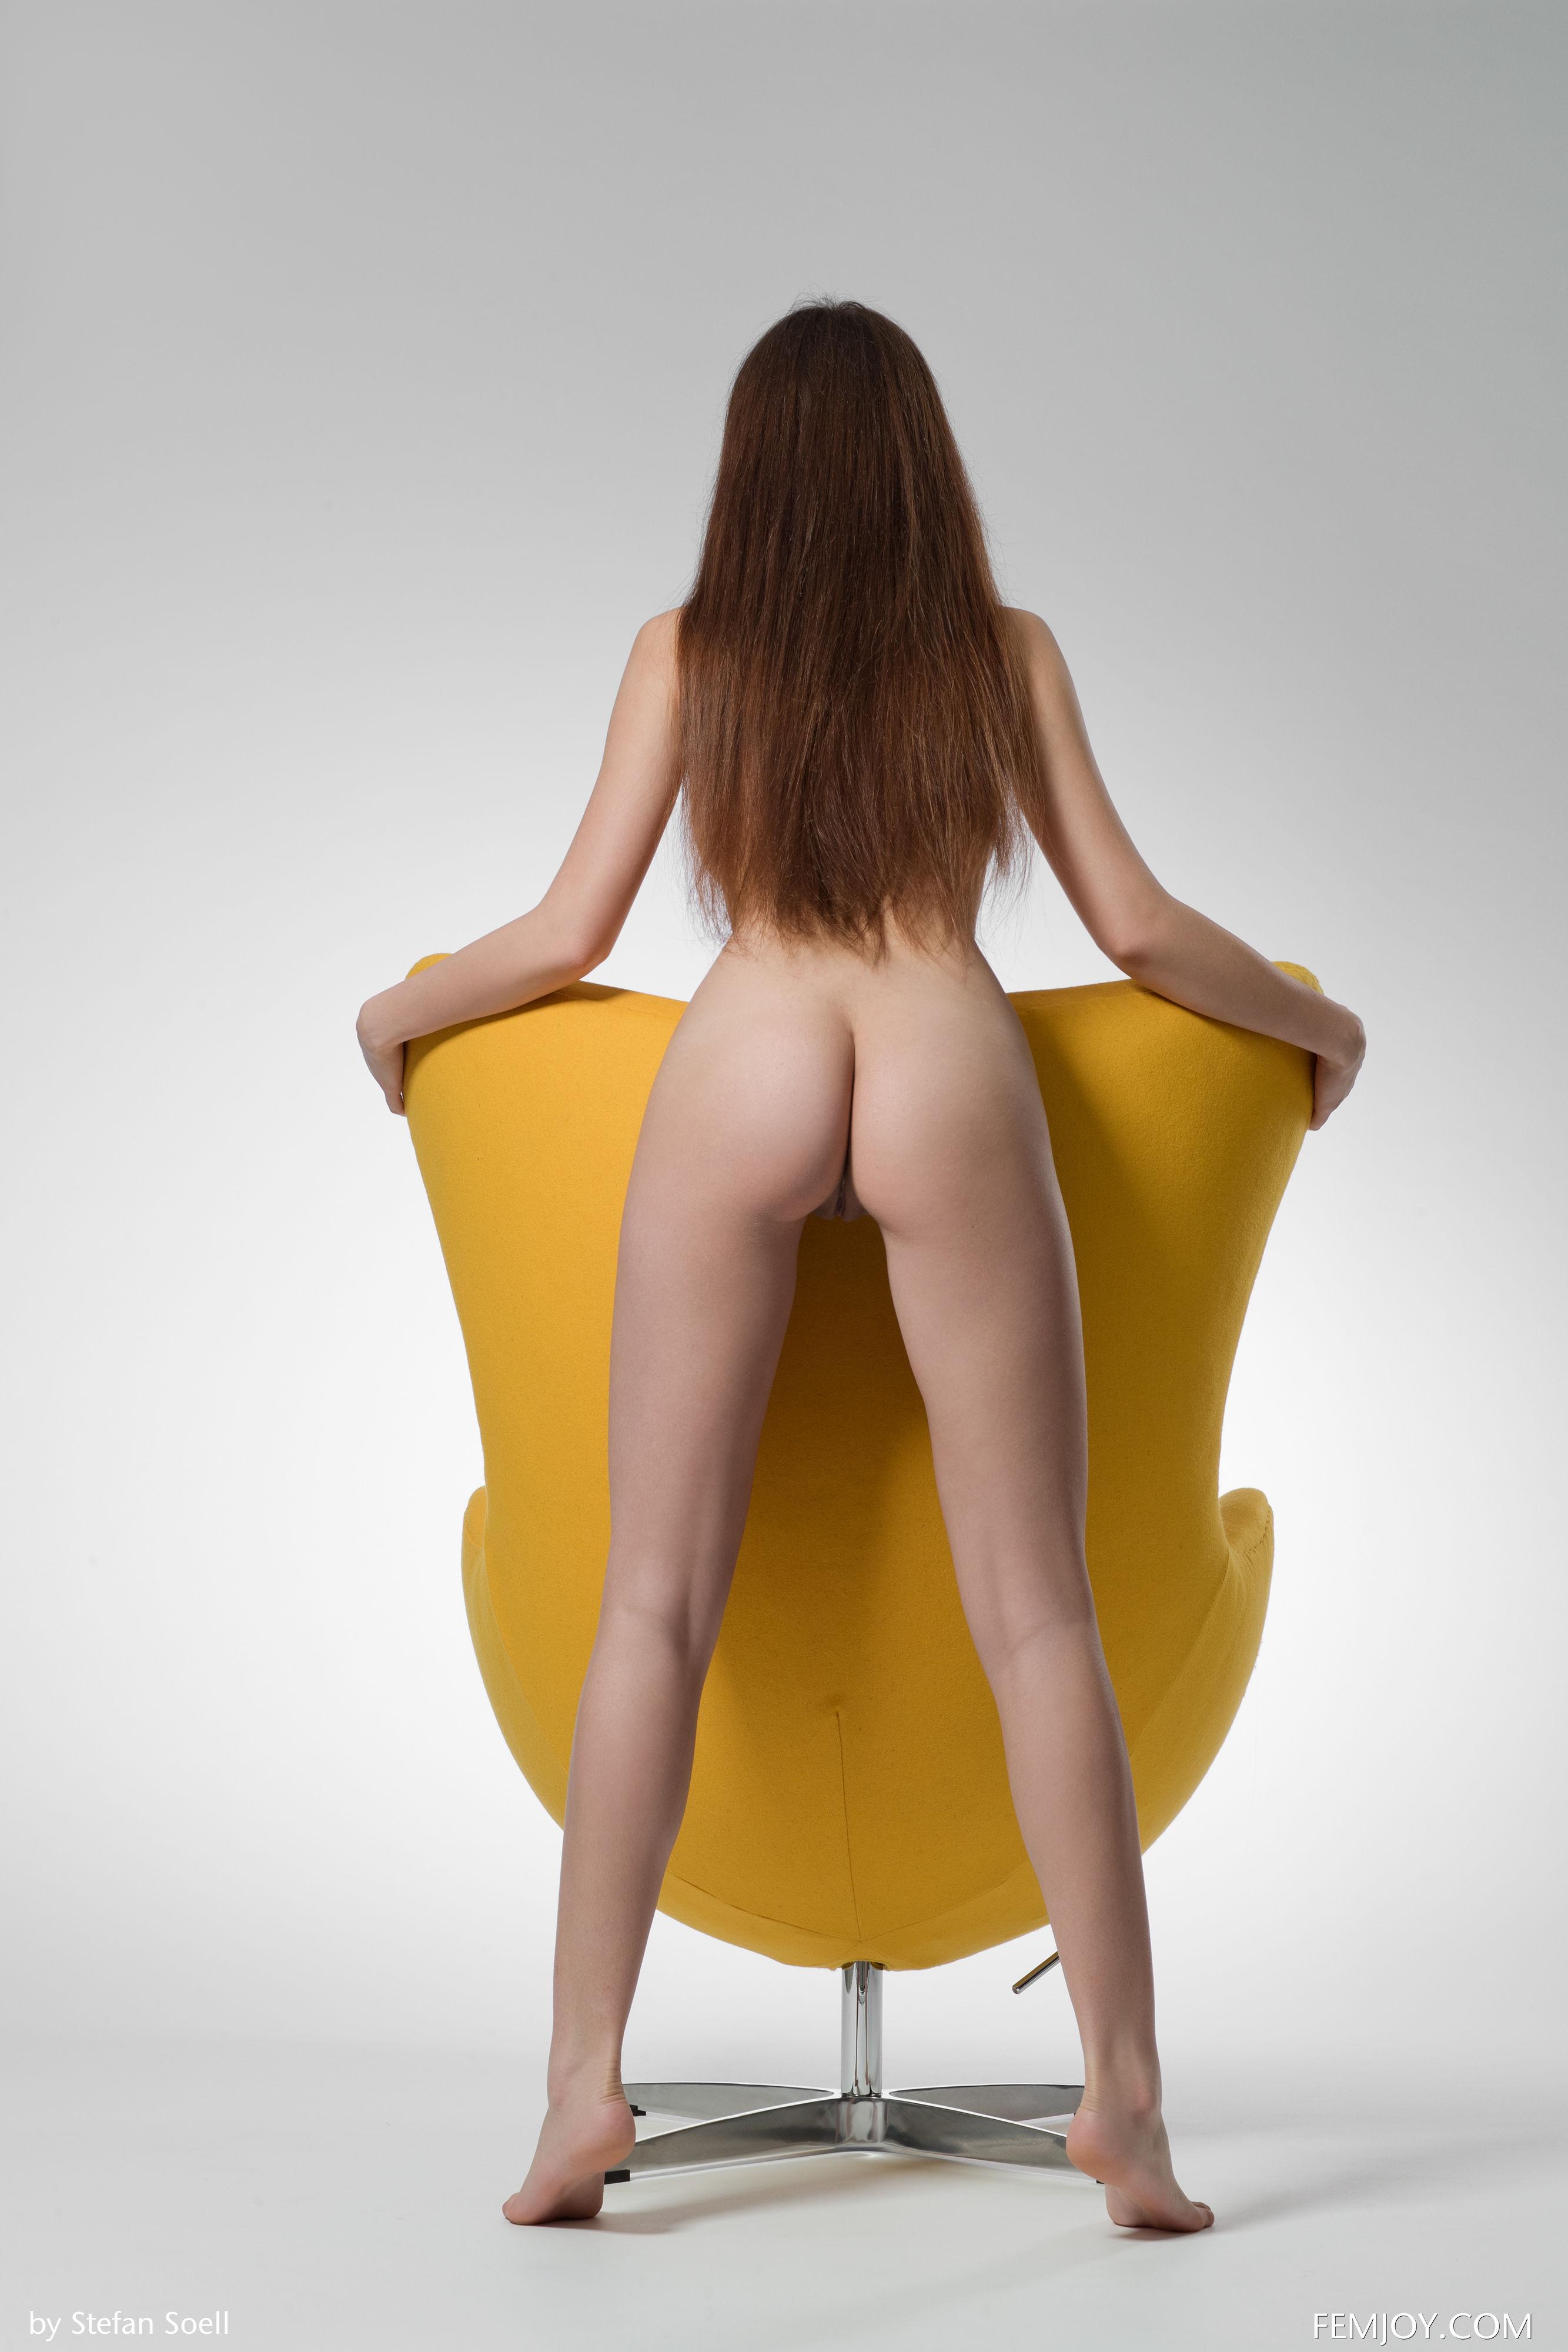 76857689_alisai_femjoy_stefansoell_yellow_19052018p_30.jpg